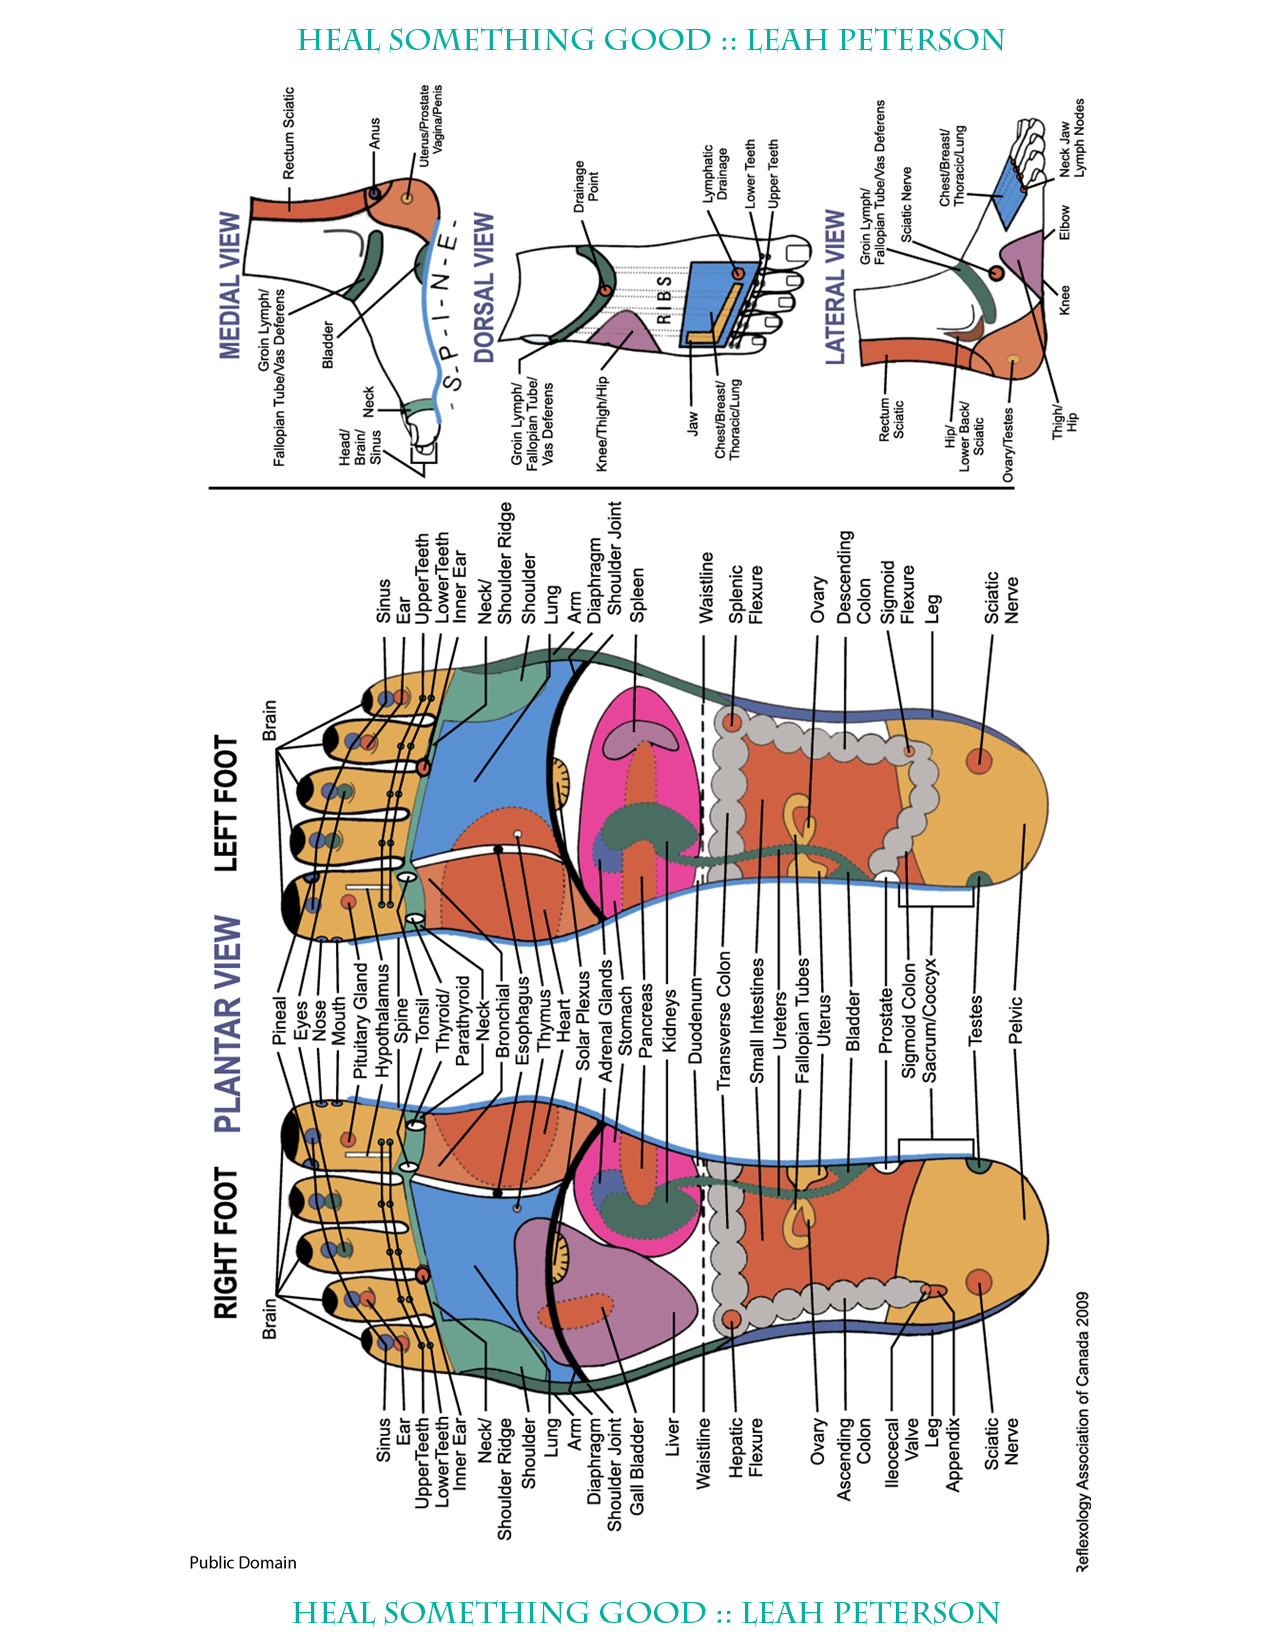 Reflexive Foot